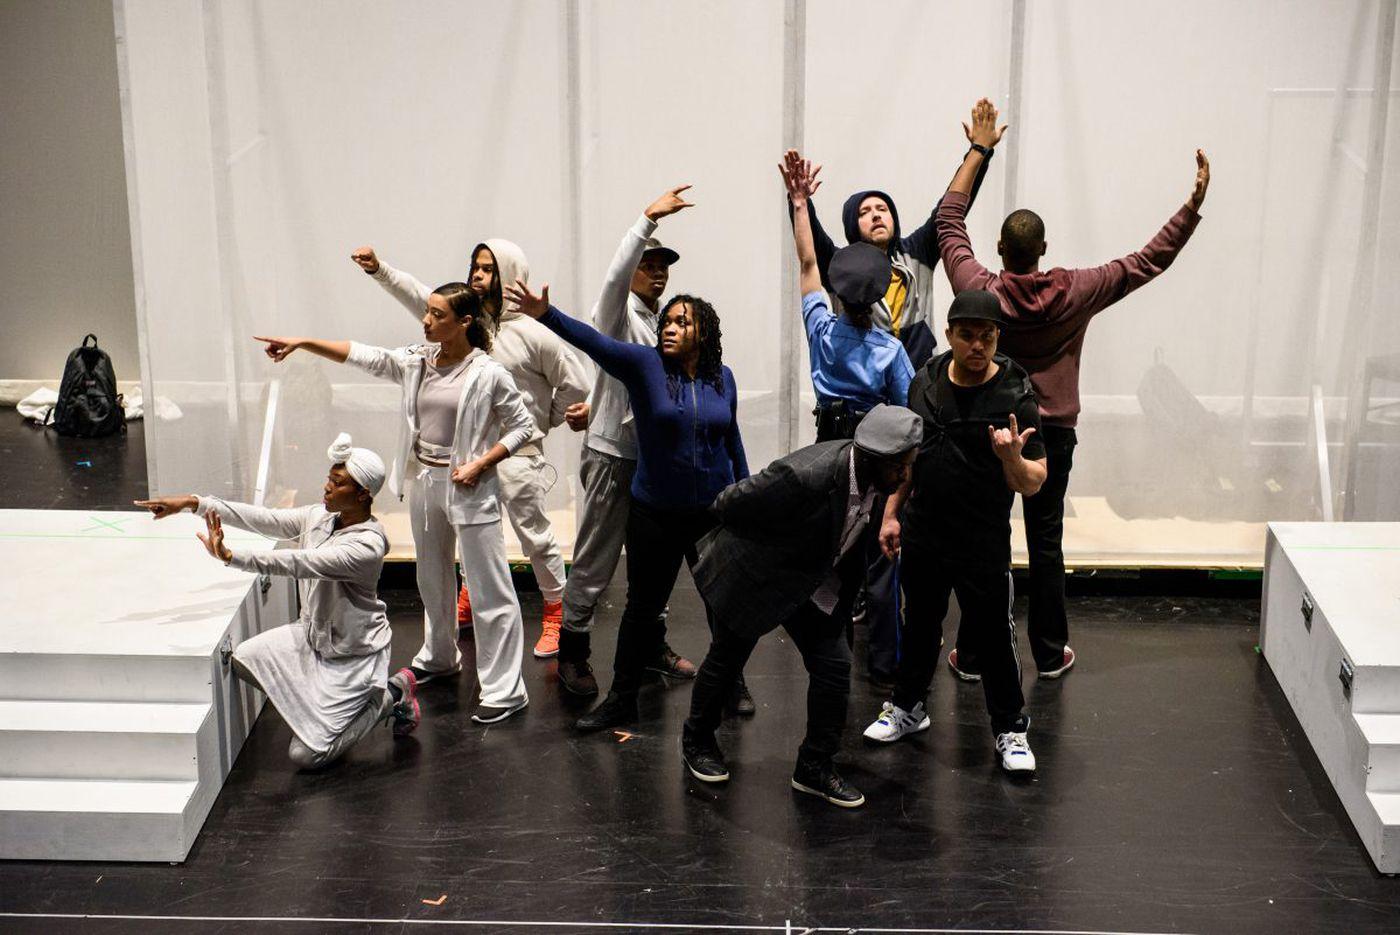 MOVE bombing will be the subject of Philadelphia opera fest world premiere